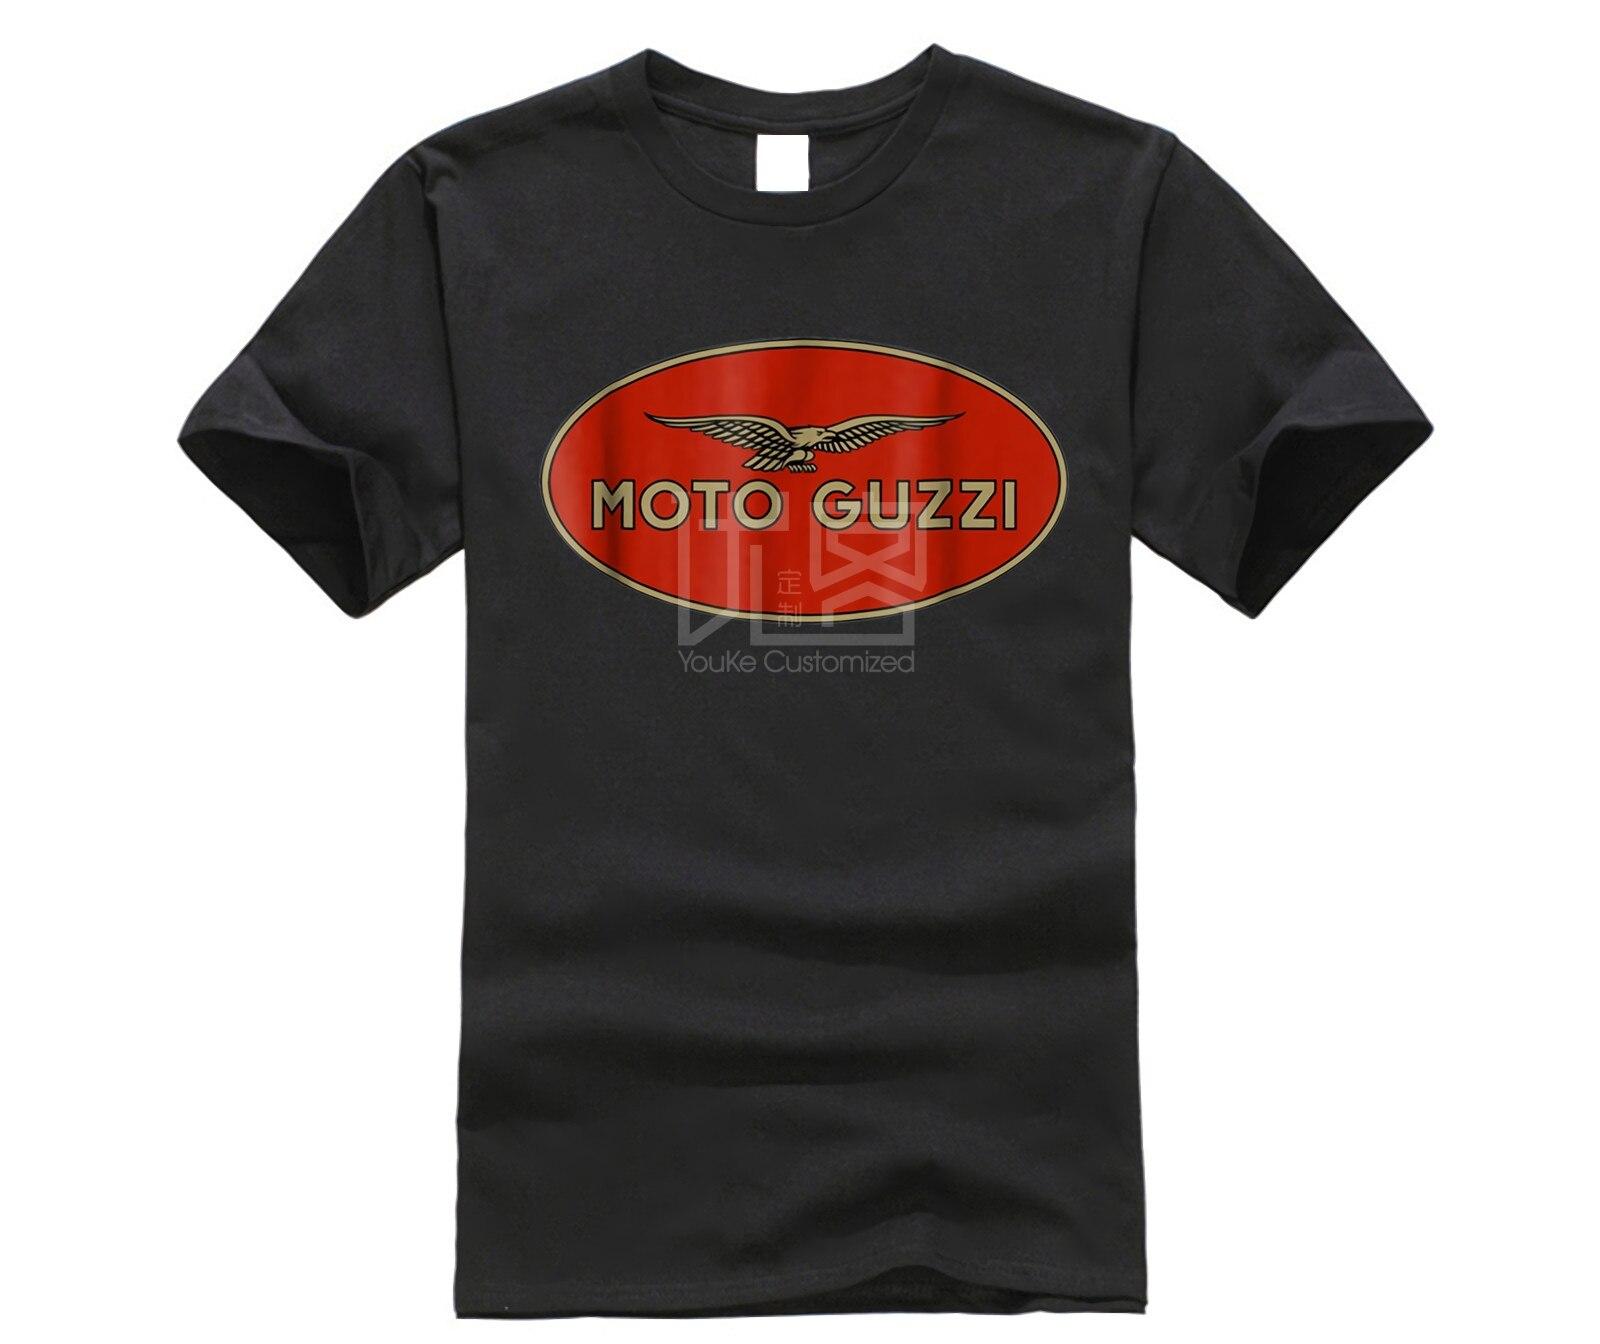 Camiseta Retro de marca para hombre Moto Guzzi